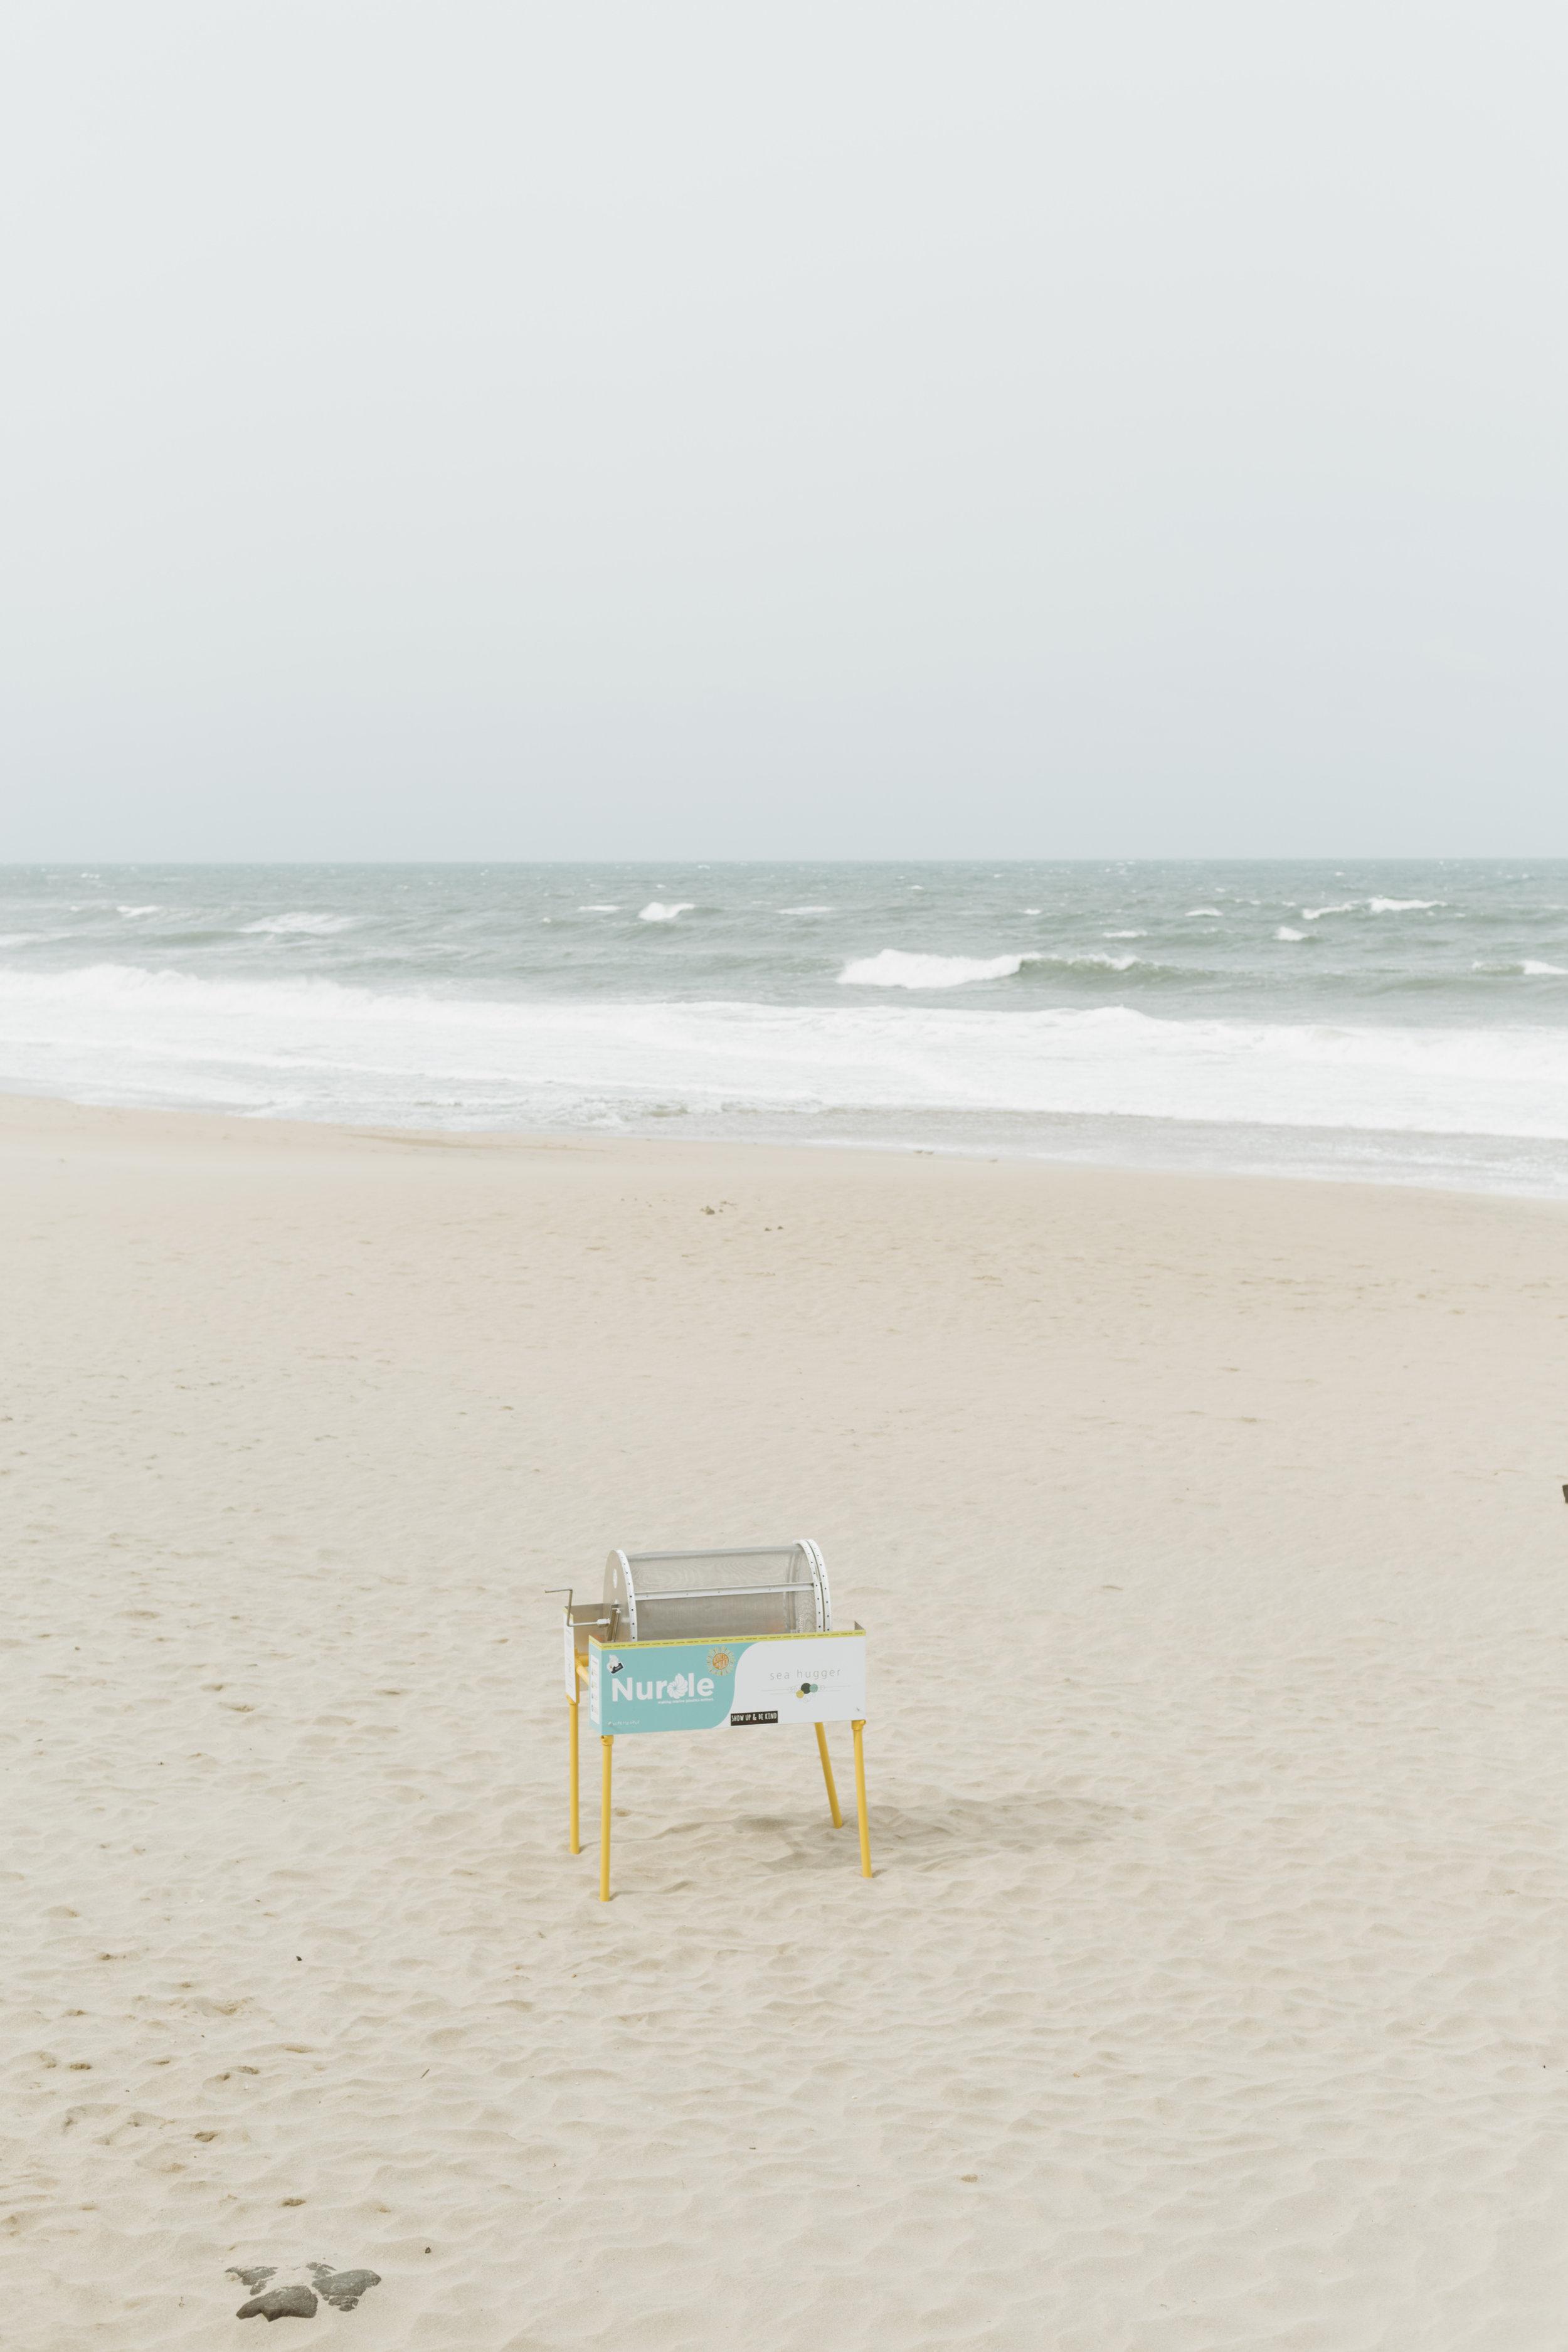 Sea Hugger's Nurdle Trommel combats marine plastic pollution.